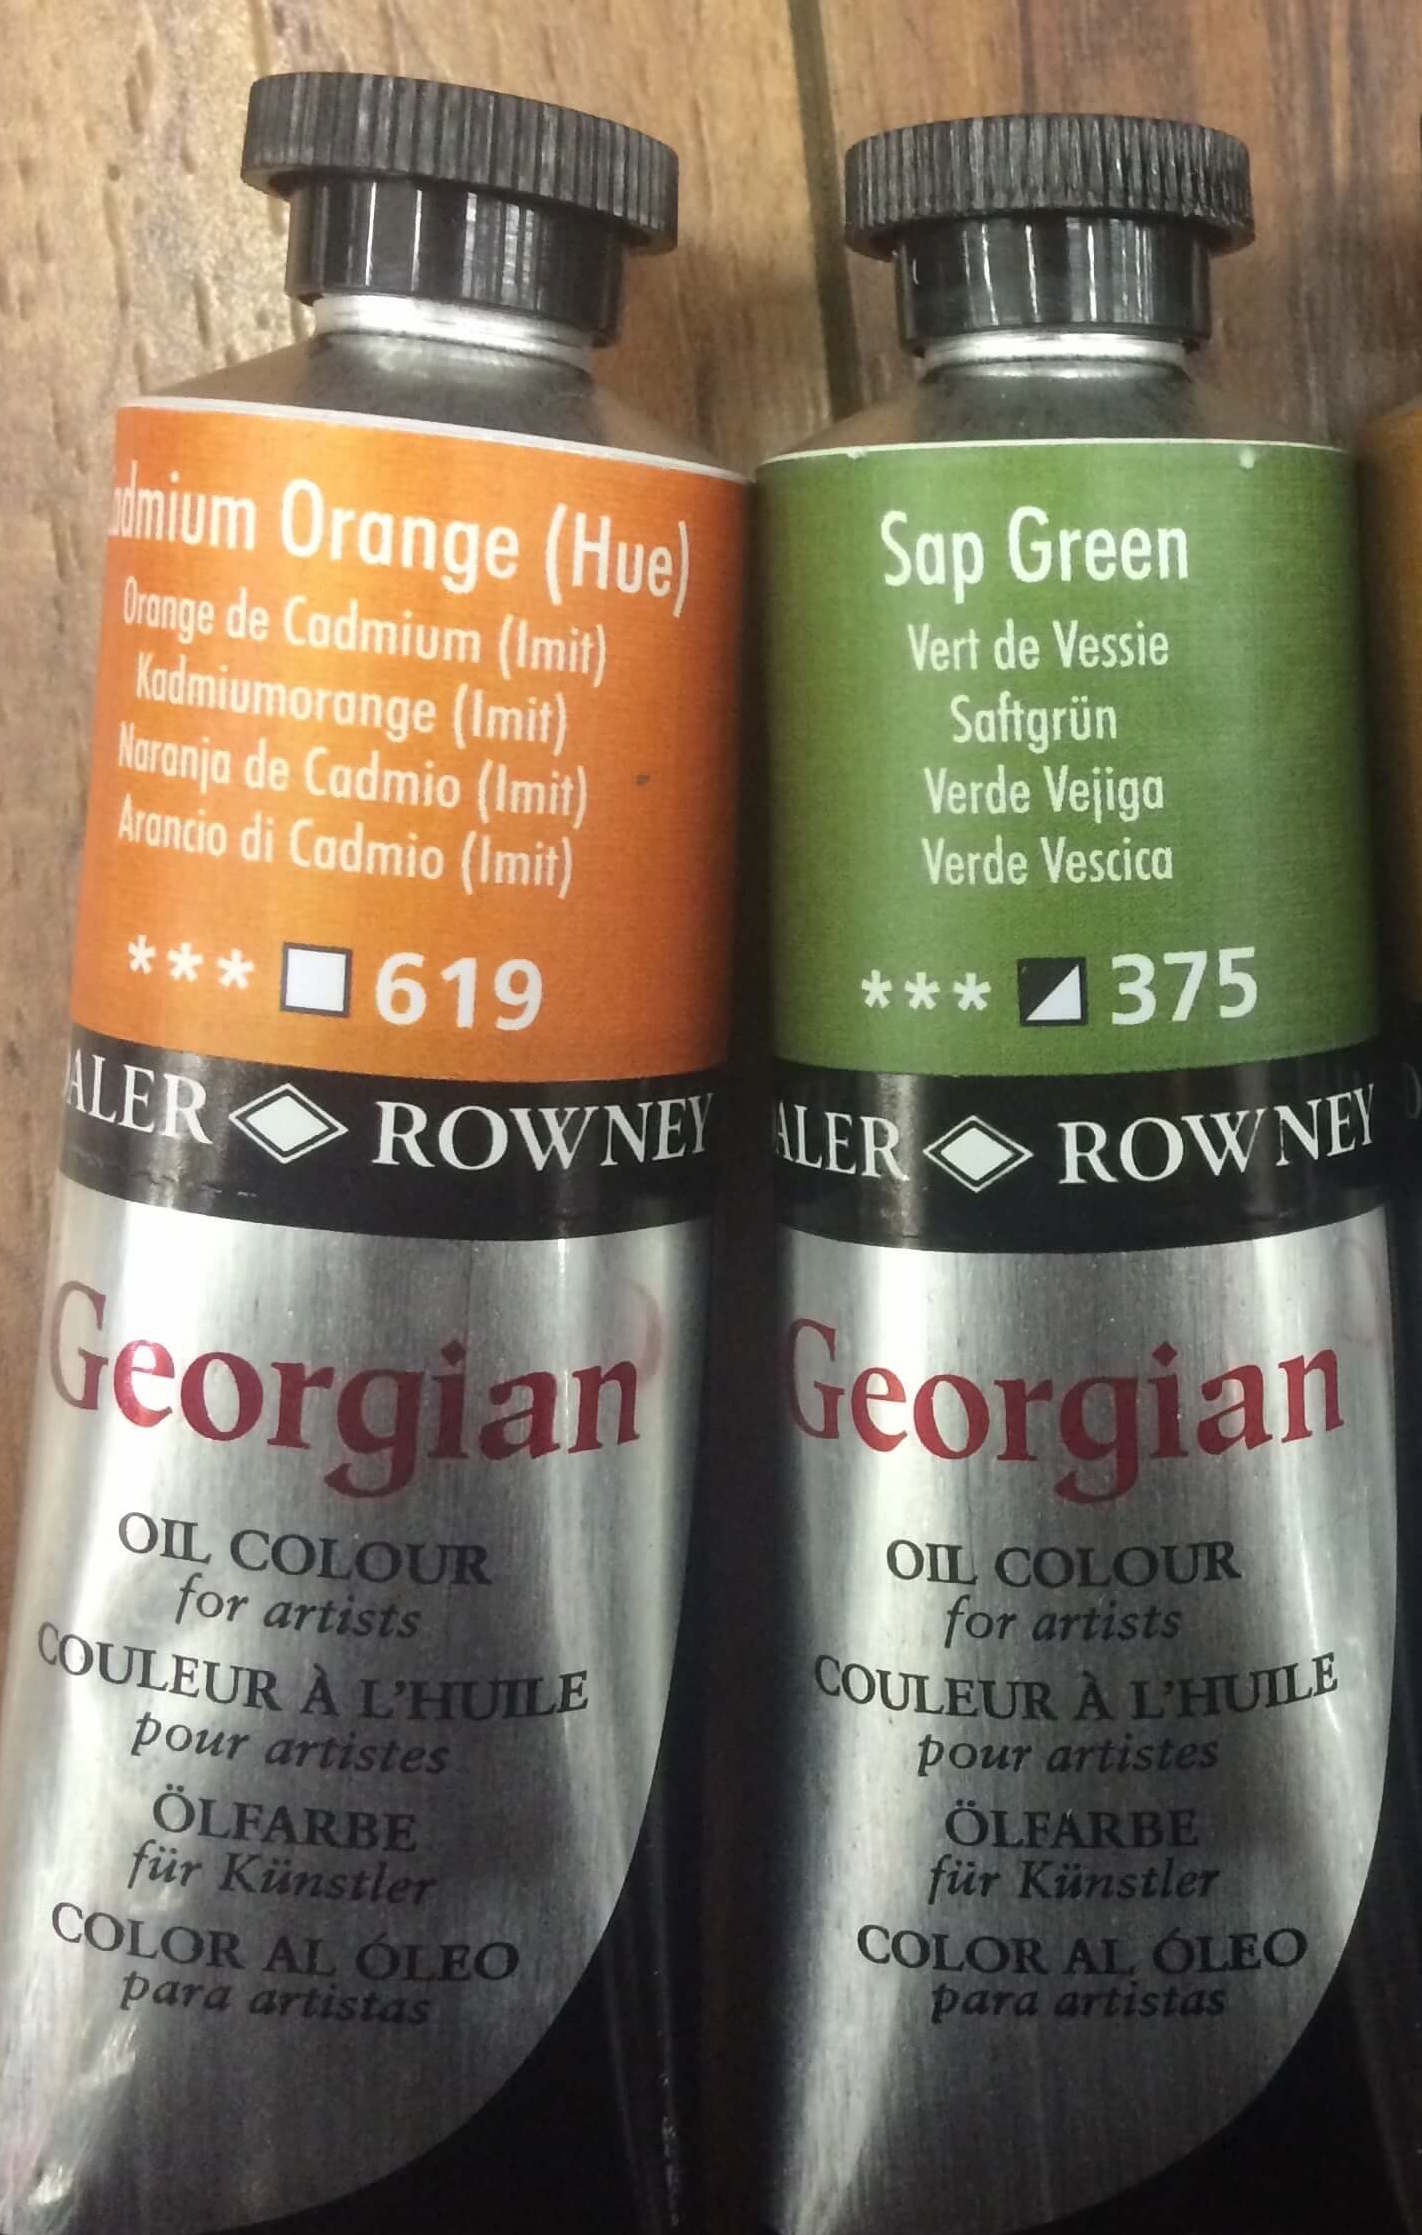 Daler Rowney | Georgian: Cadmium Orange (Hue), Sap Green